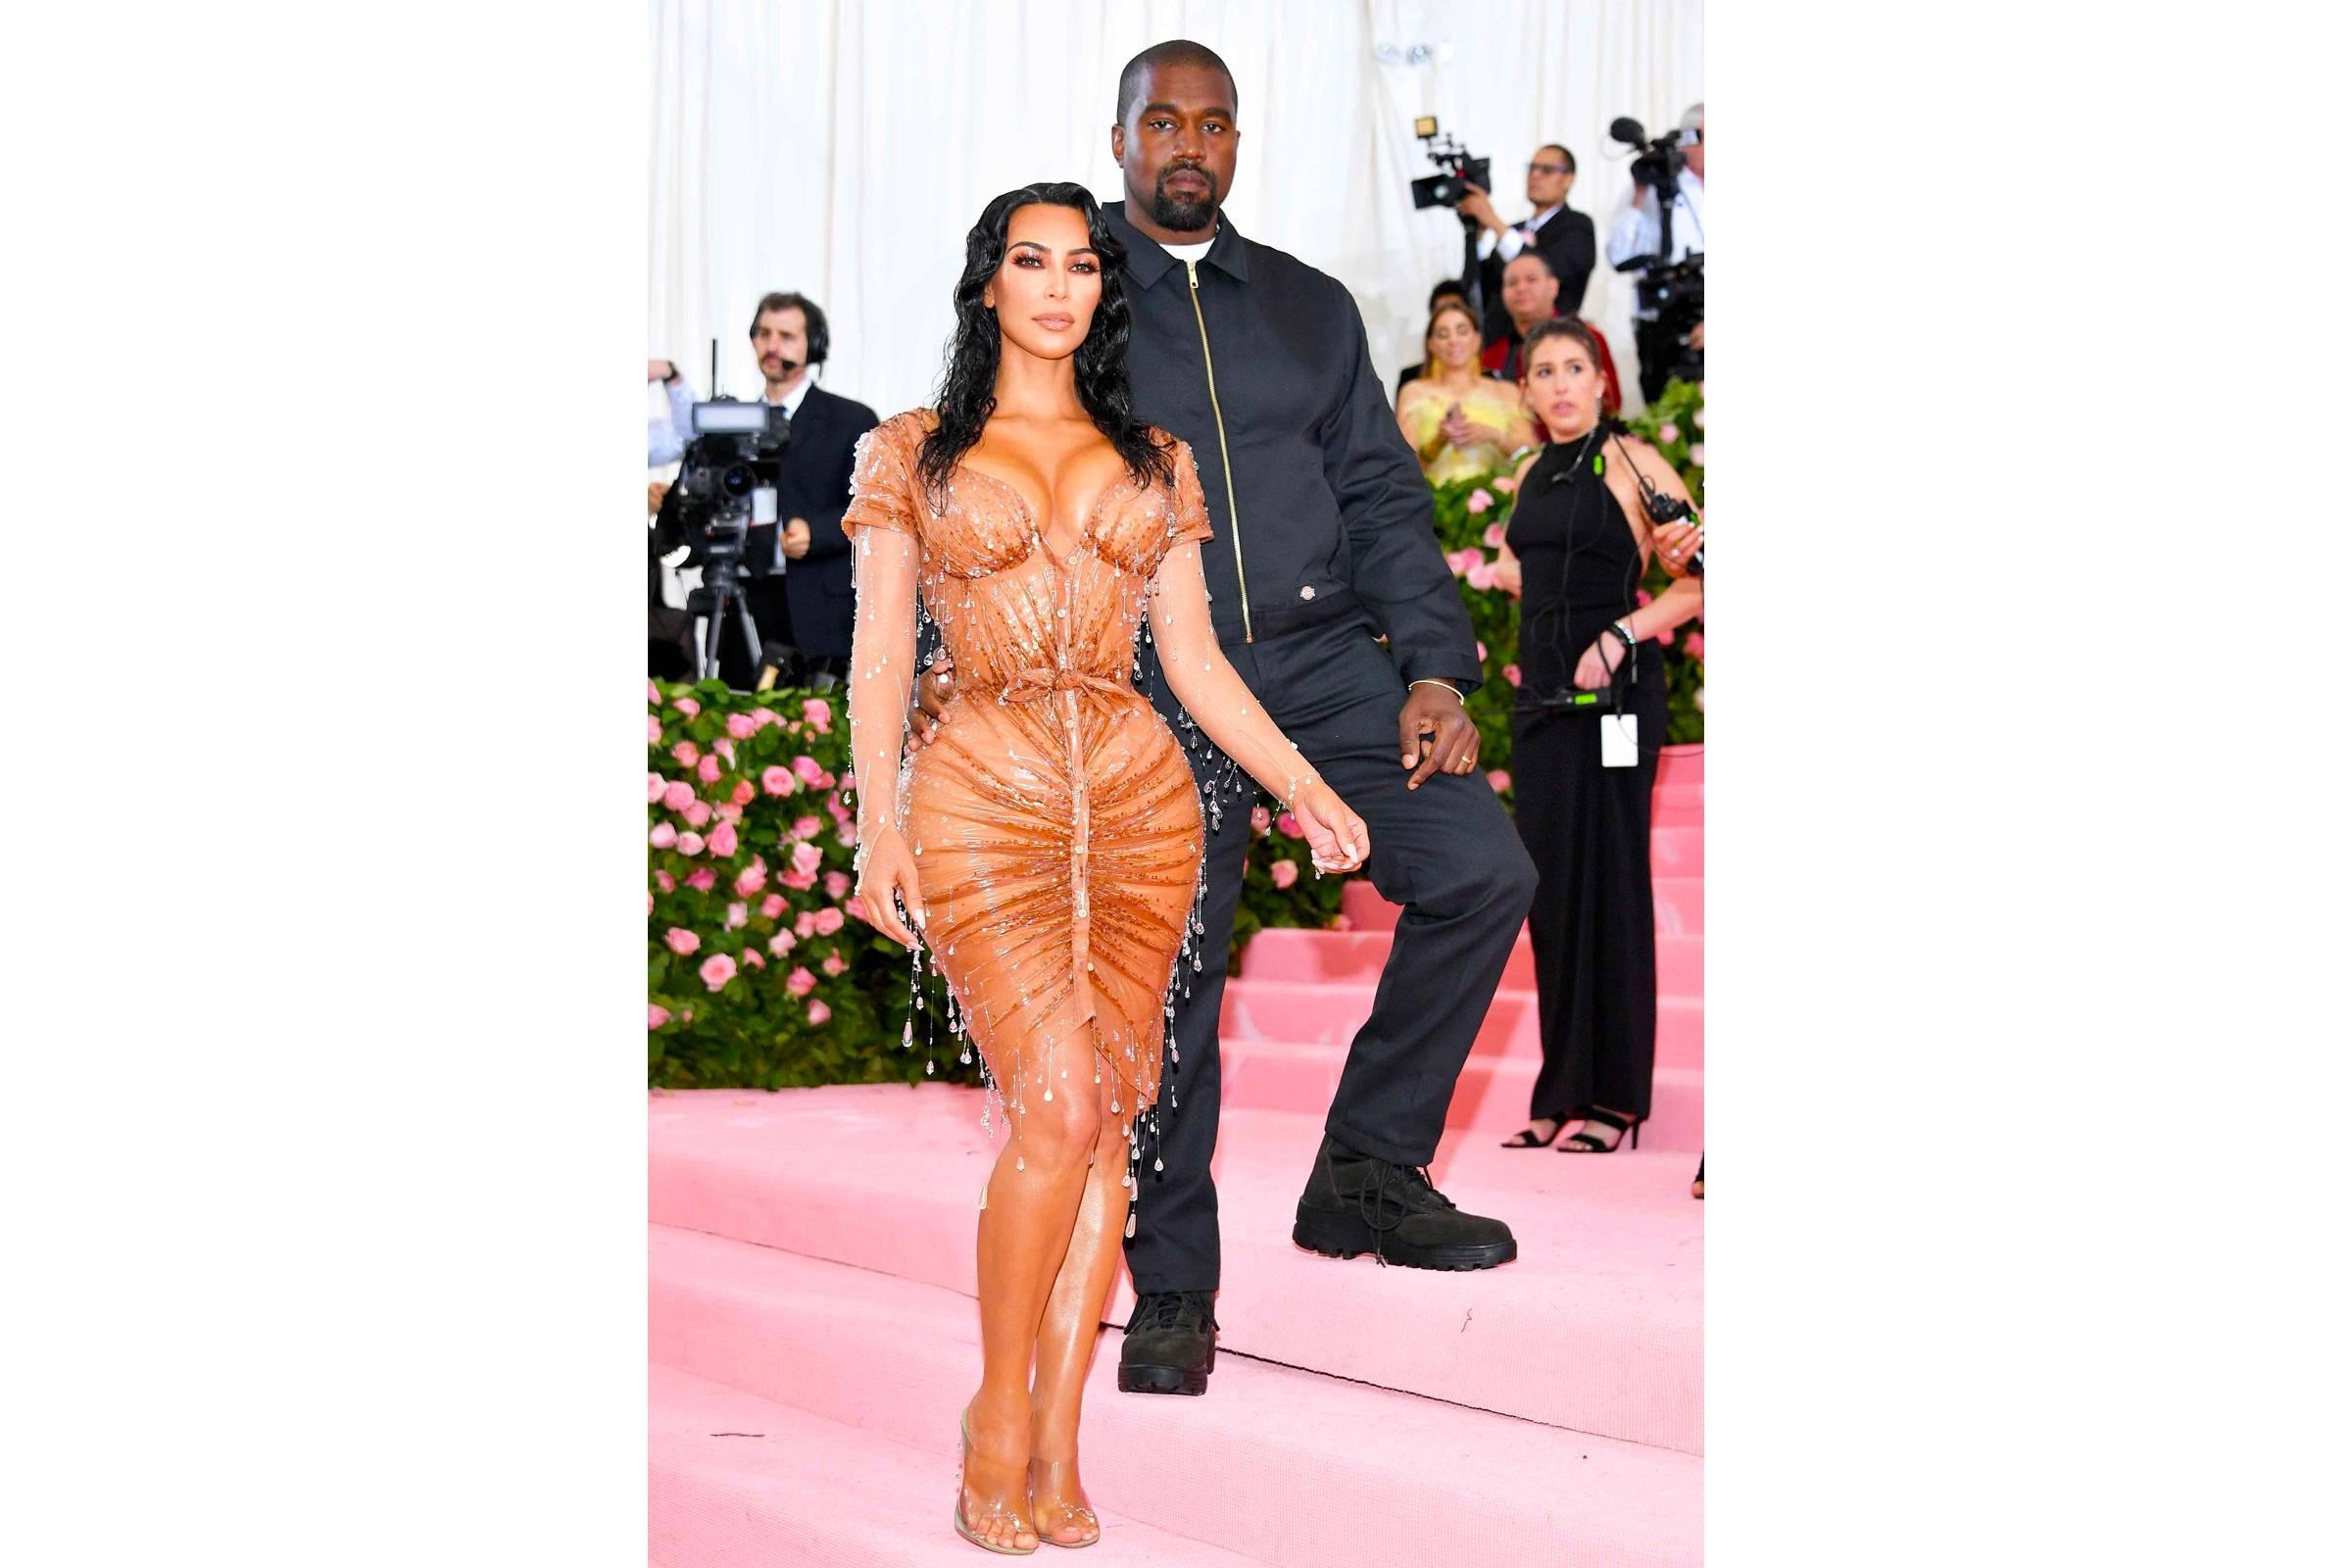 Kanye West (in Dickies) and Kim Kardashian (in Thierry Mugler)